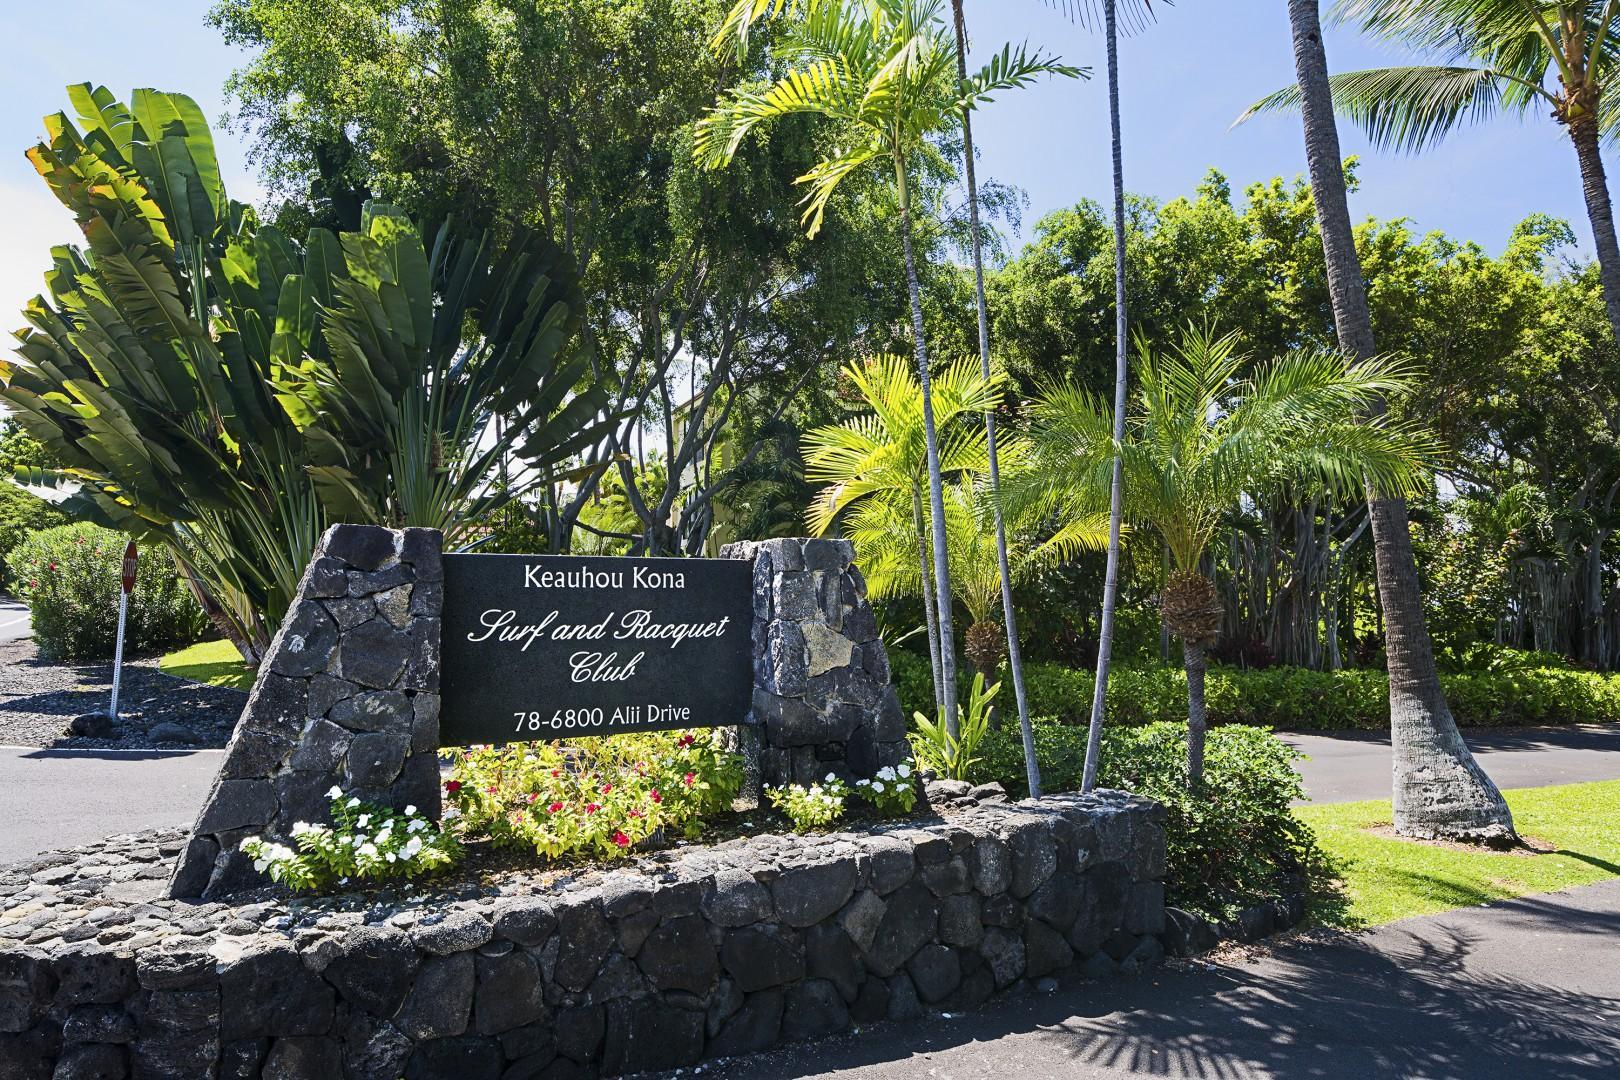 Keauhou Kona Surf & Racquet Entrance